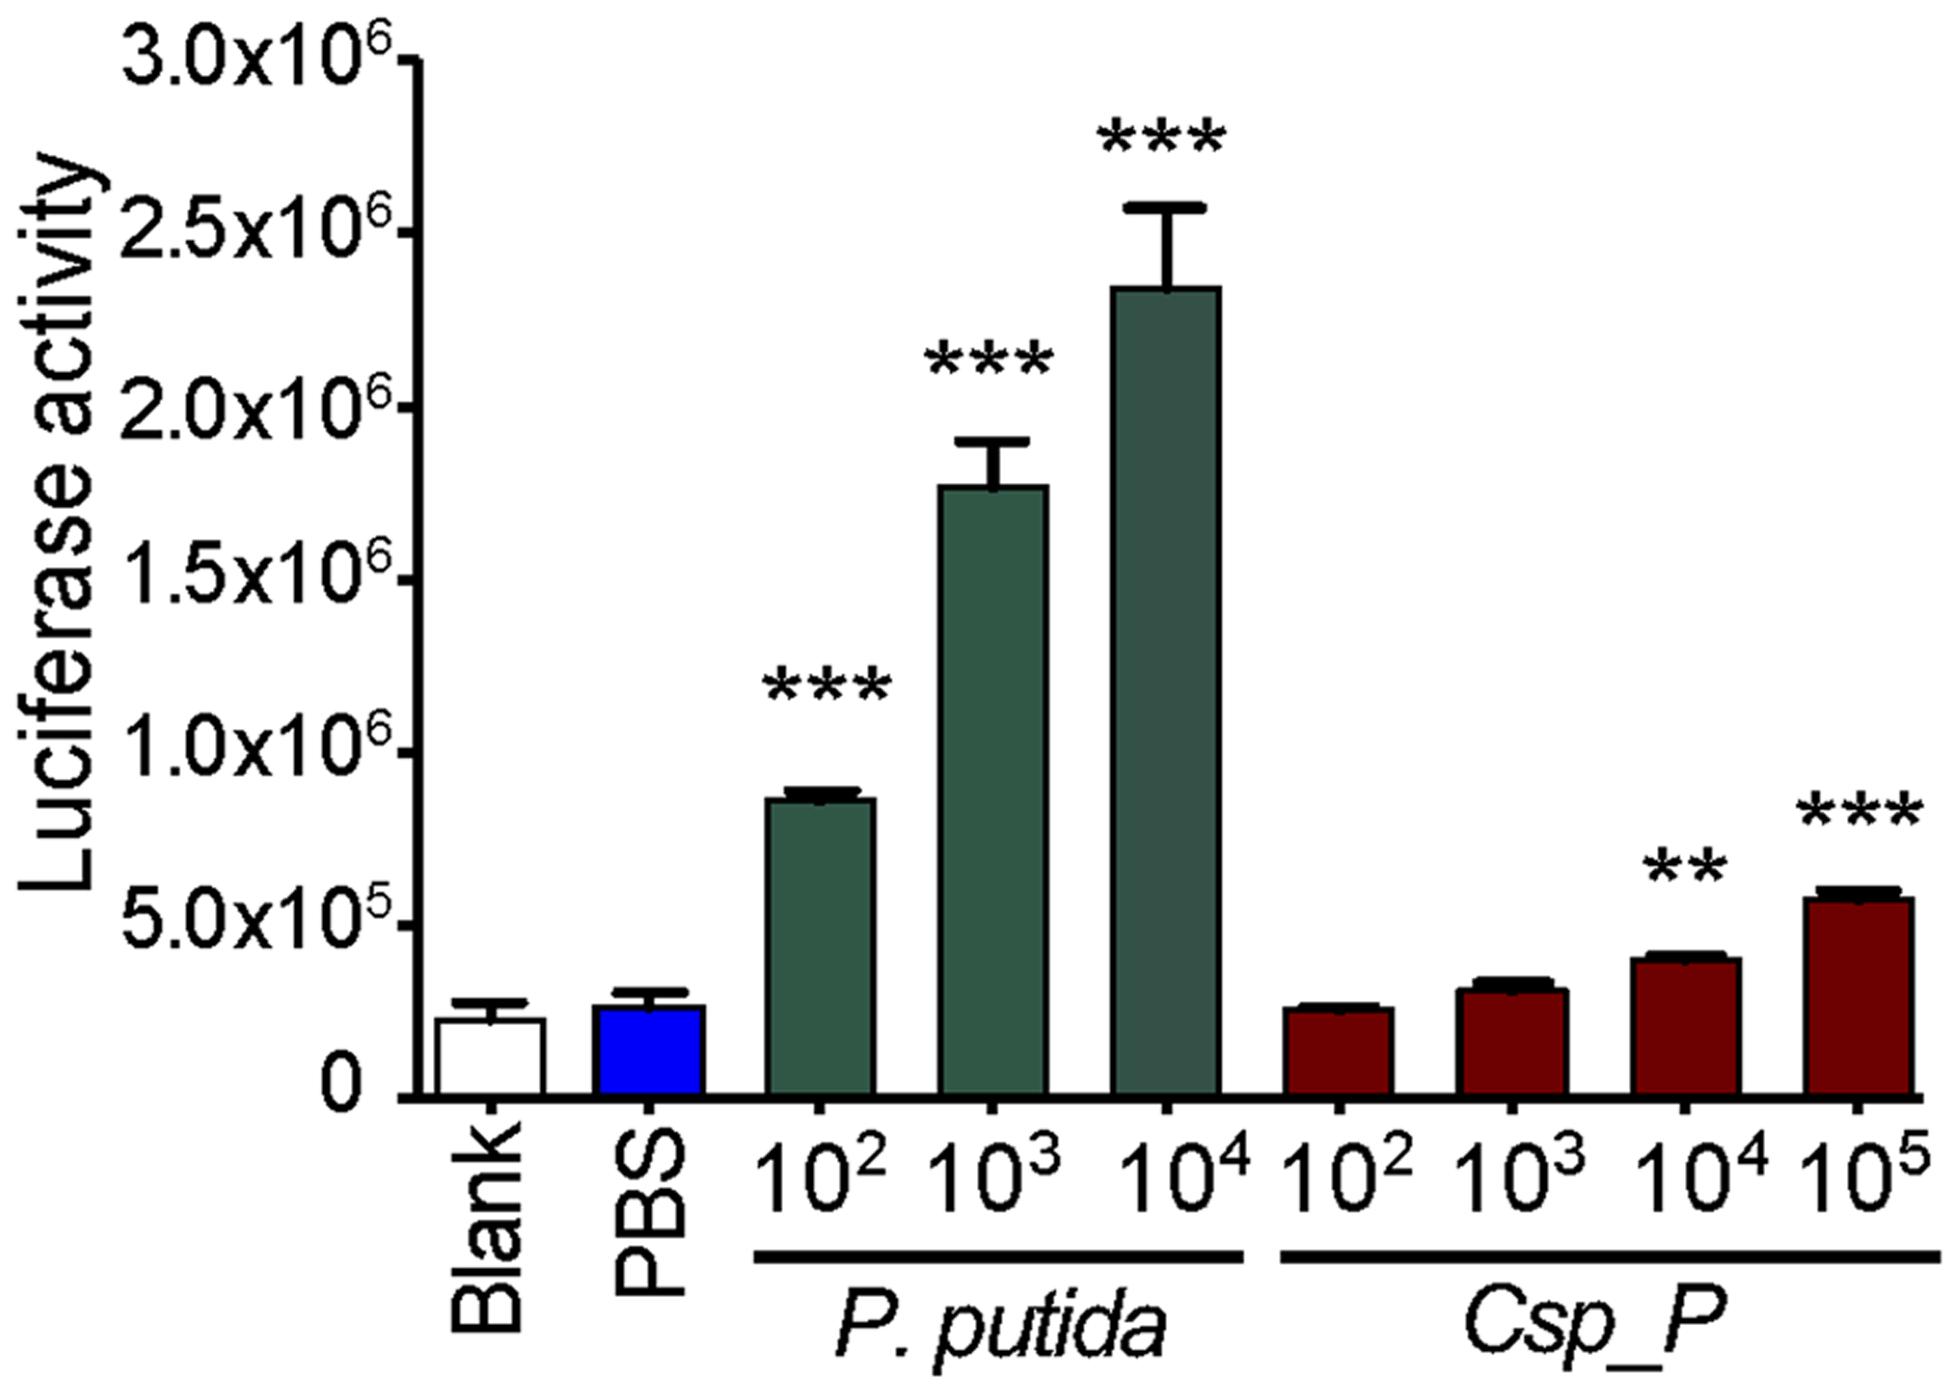 <i>Csp_P</i> elicits immune gene expression in the mosquito.